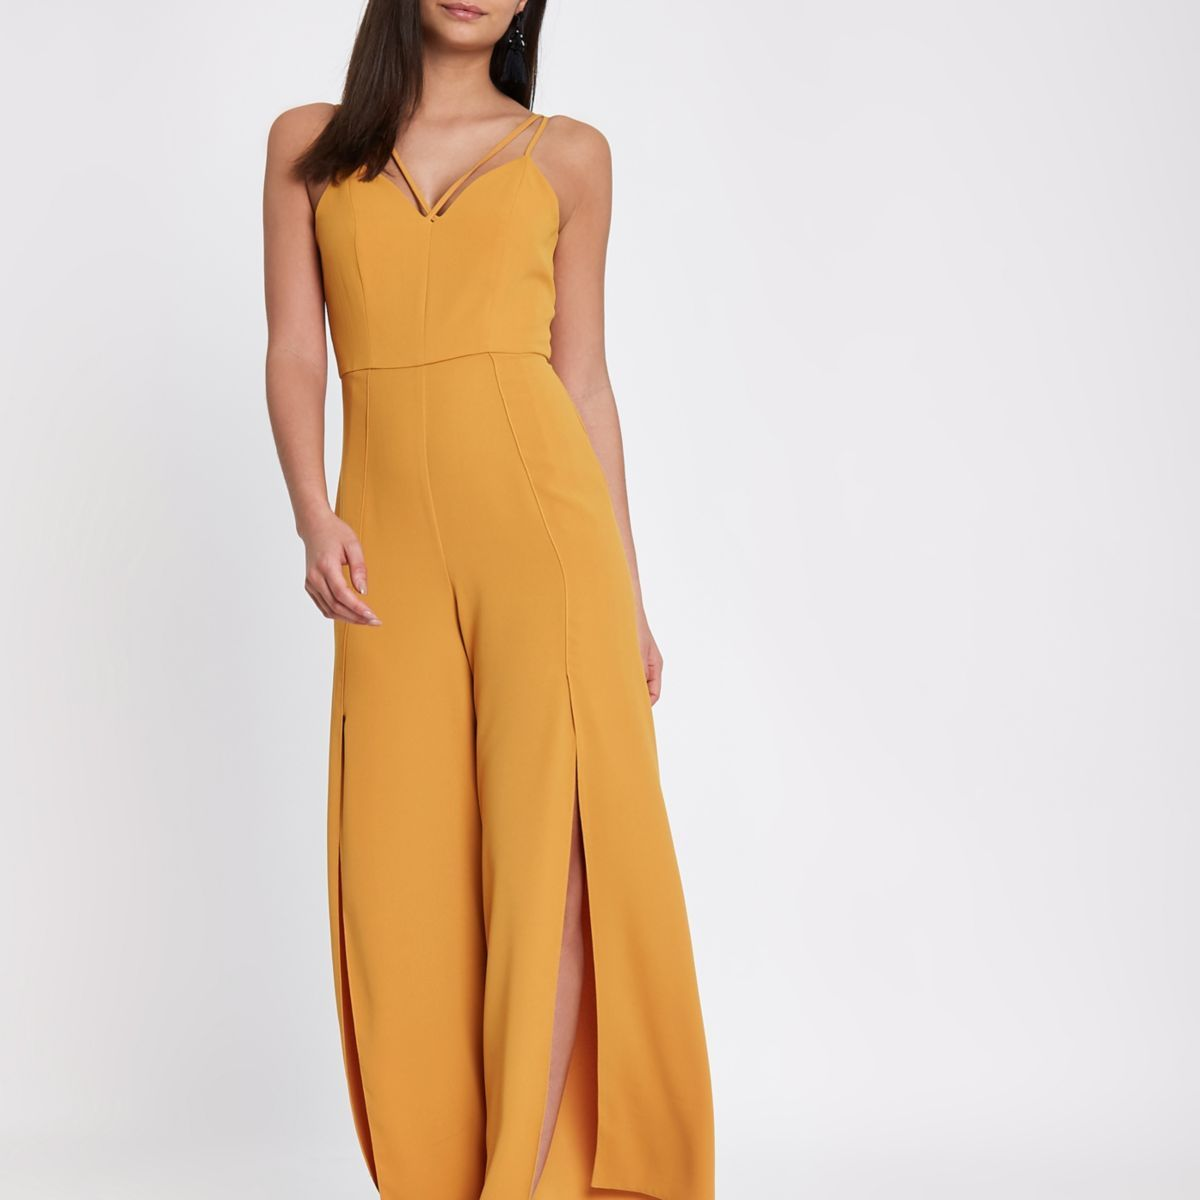 c3237f6616df Mustard yellow wide split leg cami jumpsuit - Jumpsuits - Rompers    Jumpsuits - women